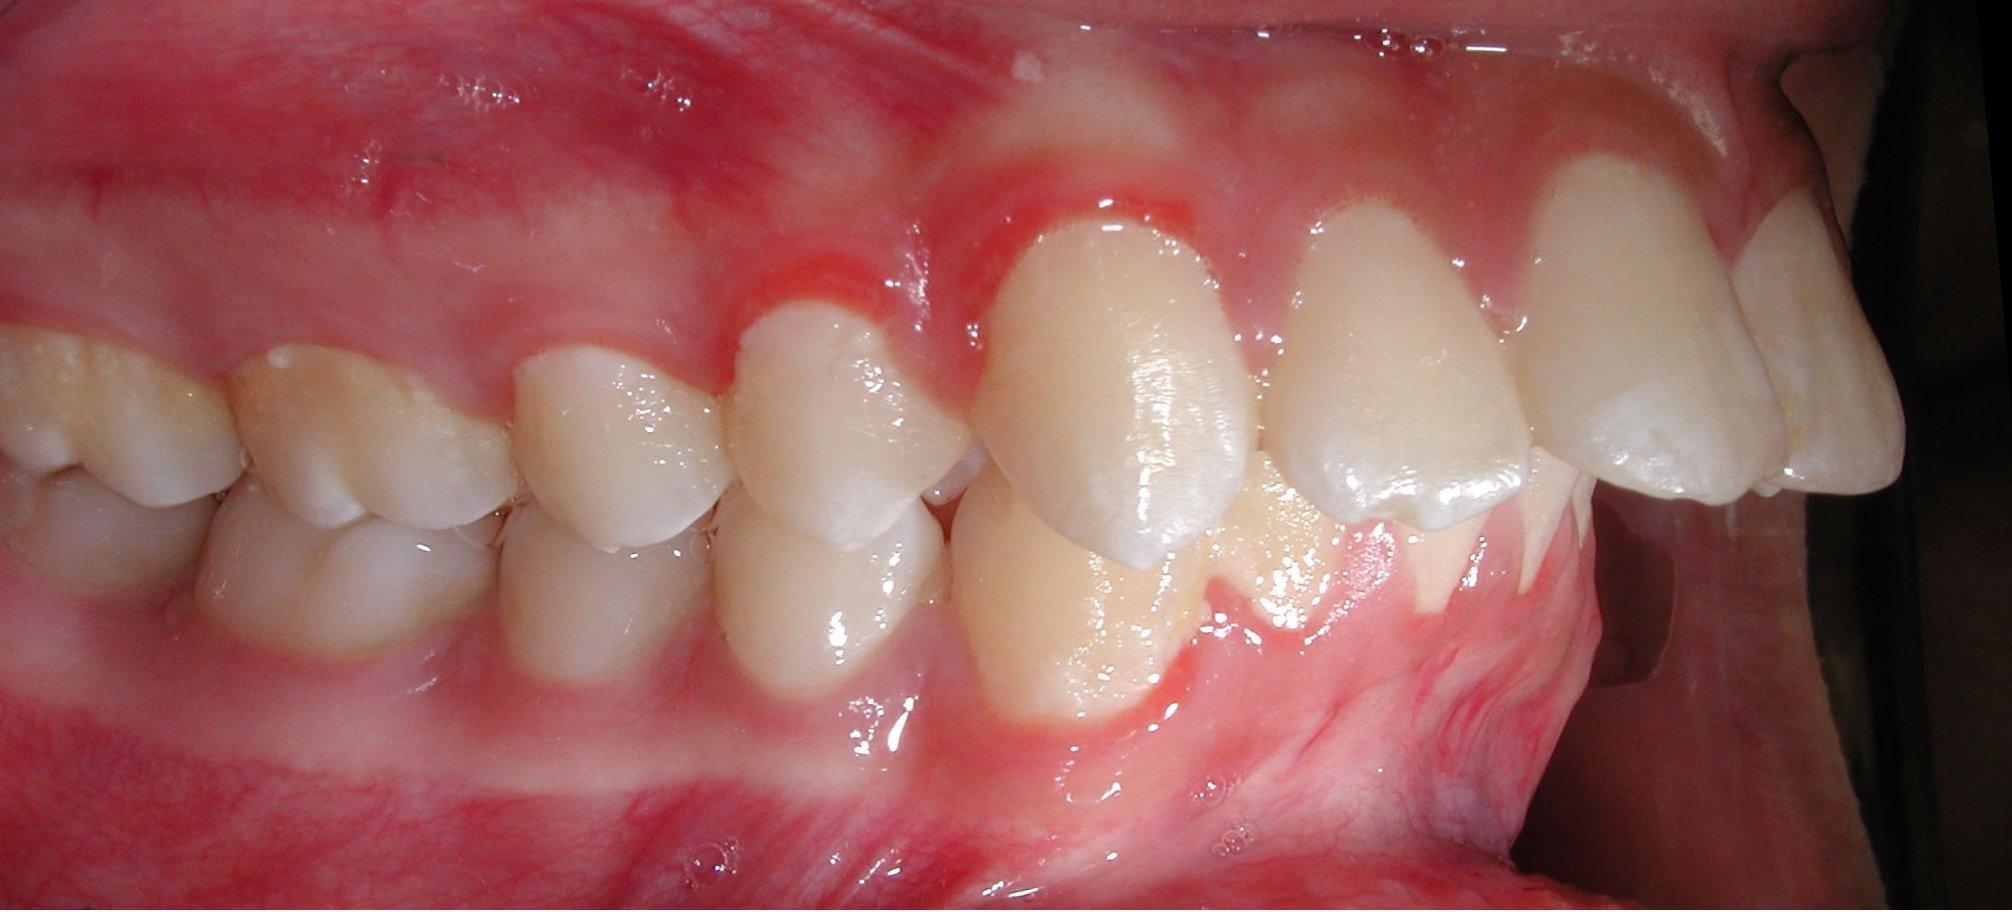 gigi maju (protrusion)